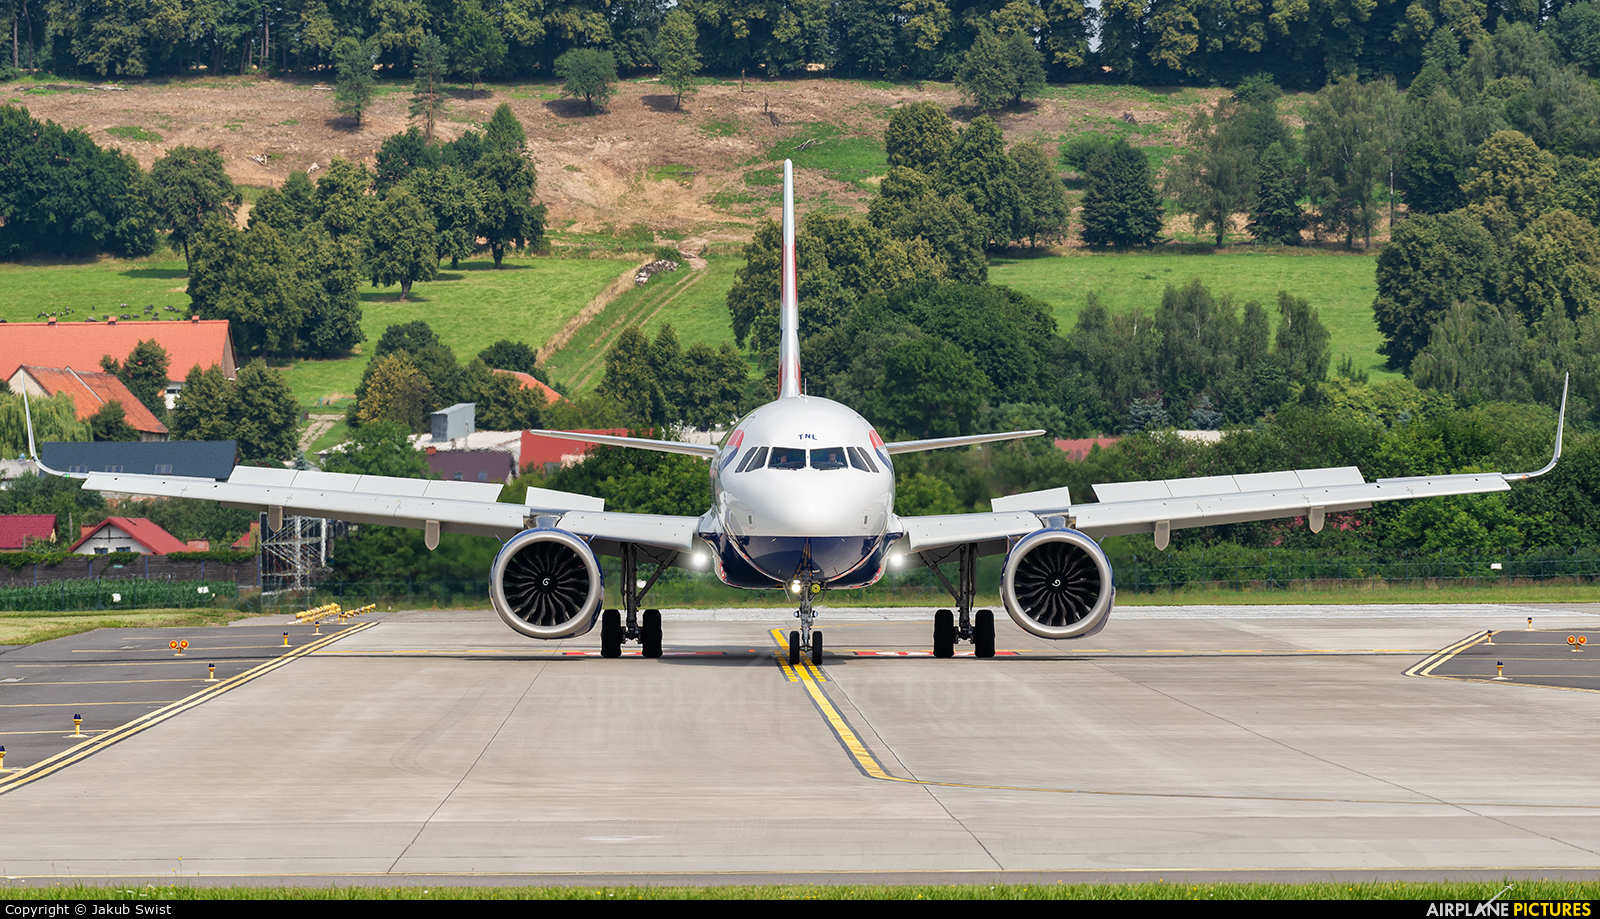 British Airways G-TTNL aircraft at Kraków - John Paul II Intl